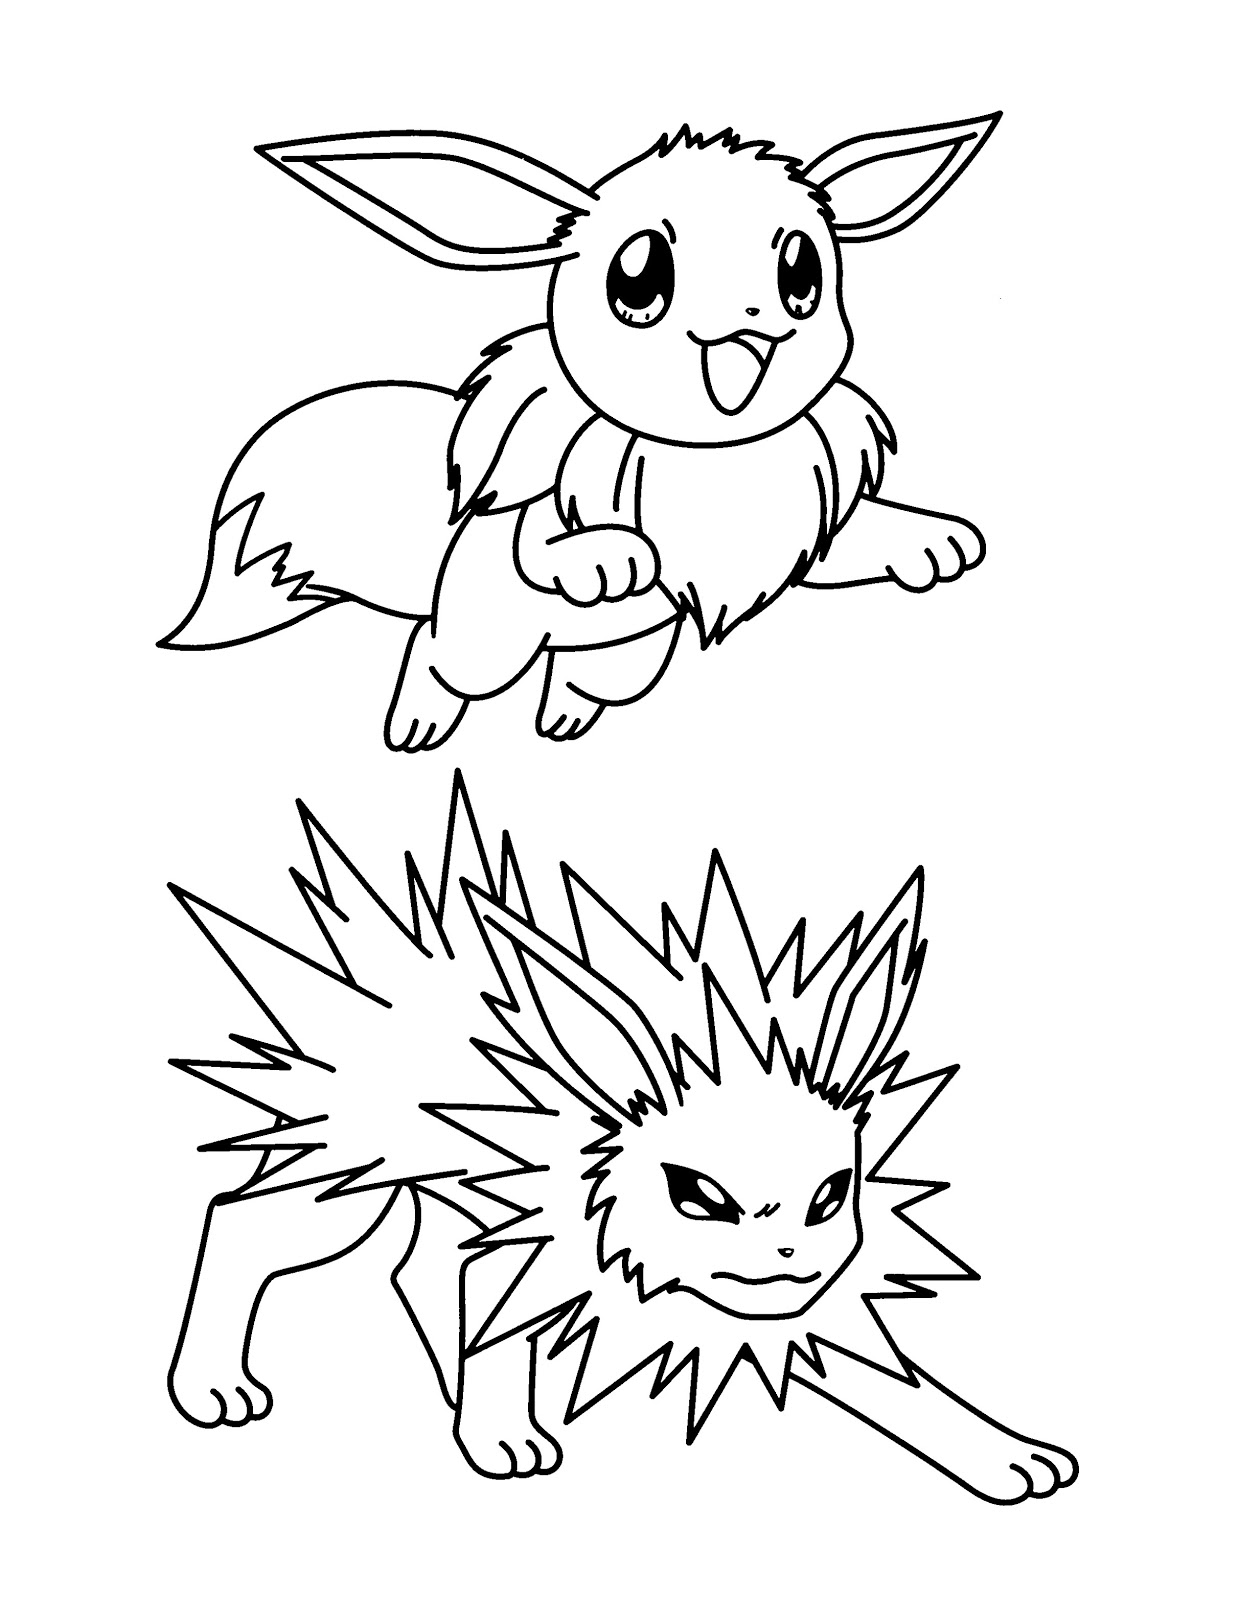 - Free Printable Pokemon Jolteon Coloring Pages - Free Pokemon